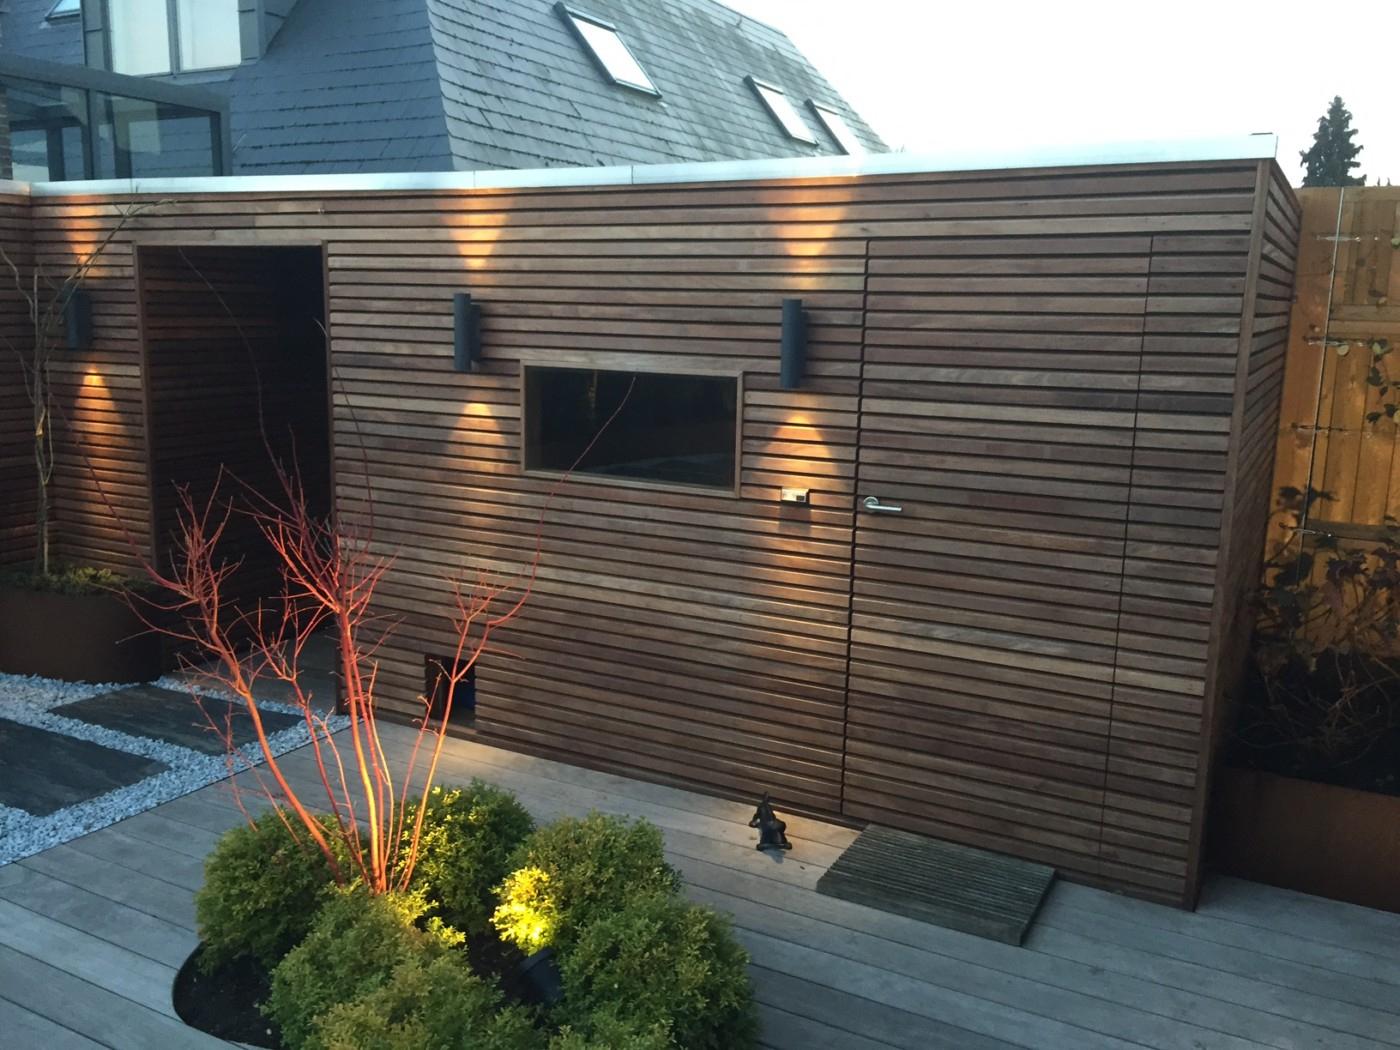 Abri De Jardin Sur Mesure Schème - Idees Conception Jardin concernant Abri De Jardin Bois Sur Mesure